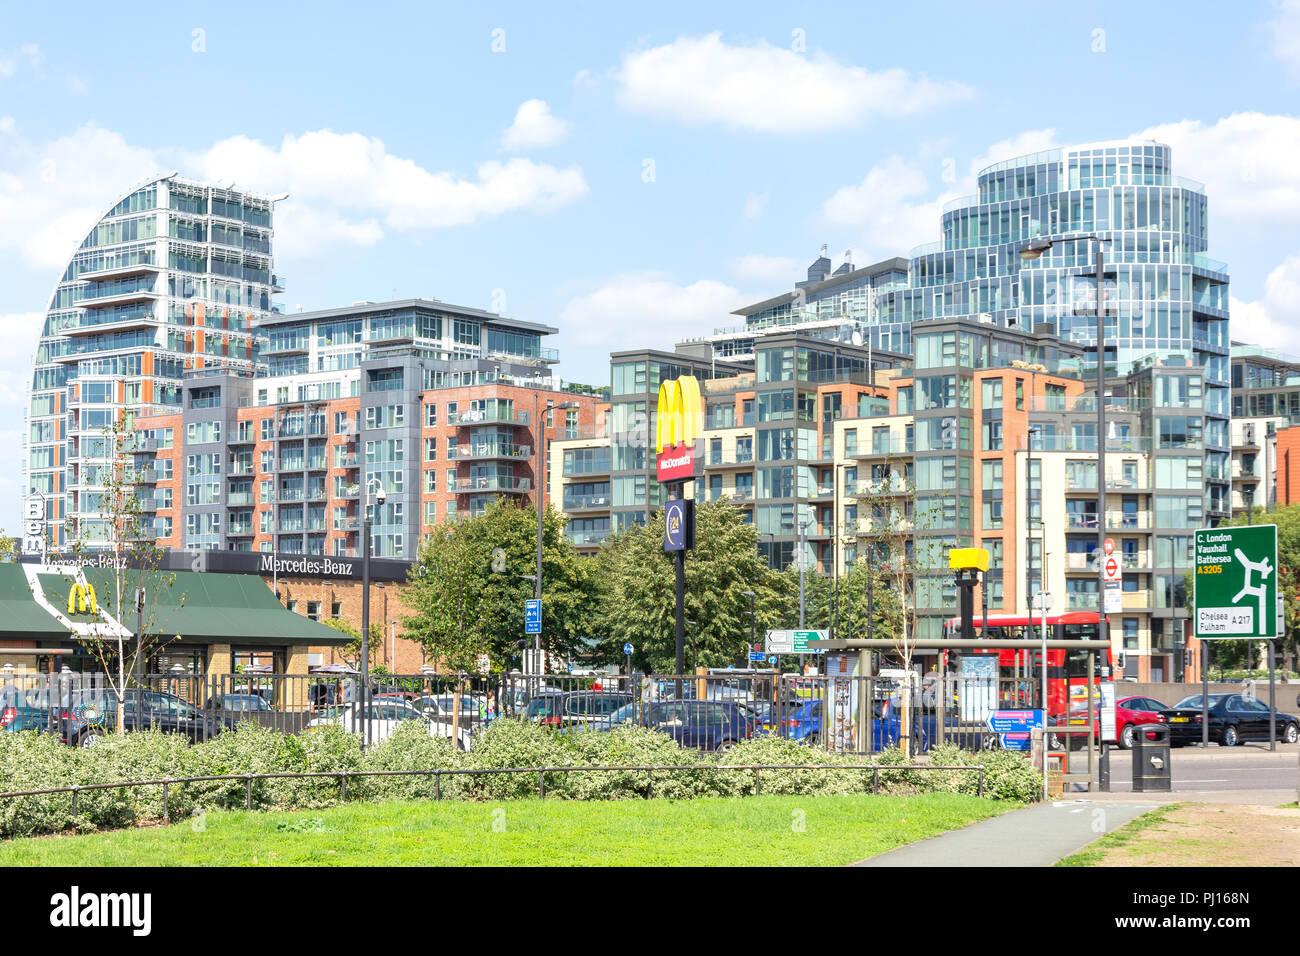 Battersea Reach apartment buildings from Wandsworth Bridge Roundabout, Wandsworth, London Borough of Wandsworth, London, England, United Kingdom - Stock Image